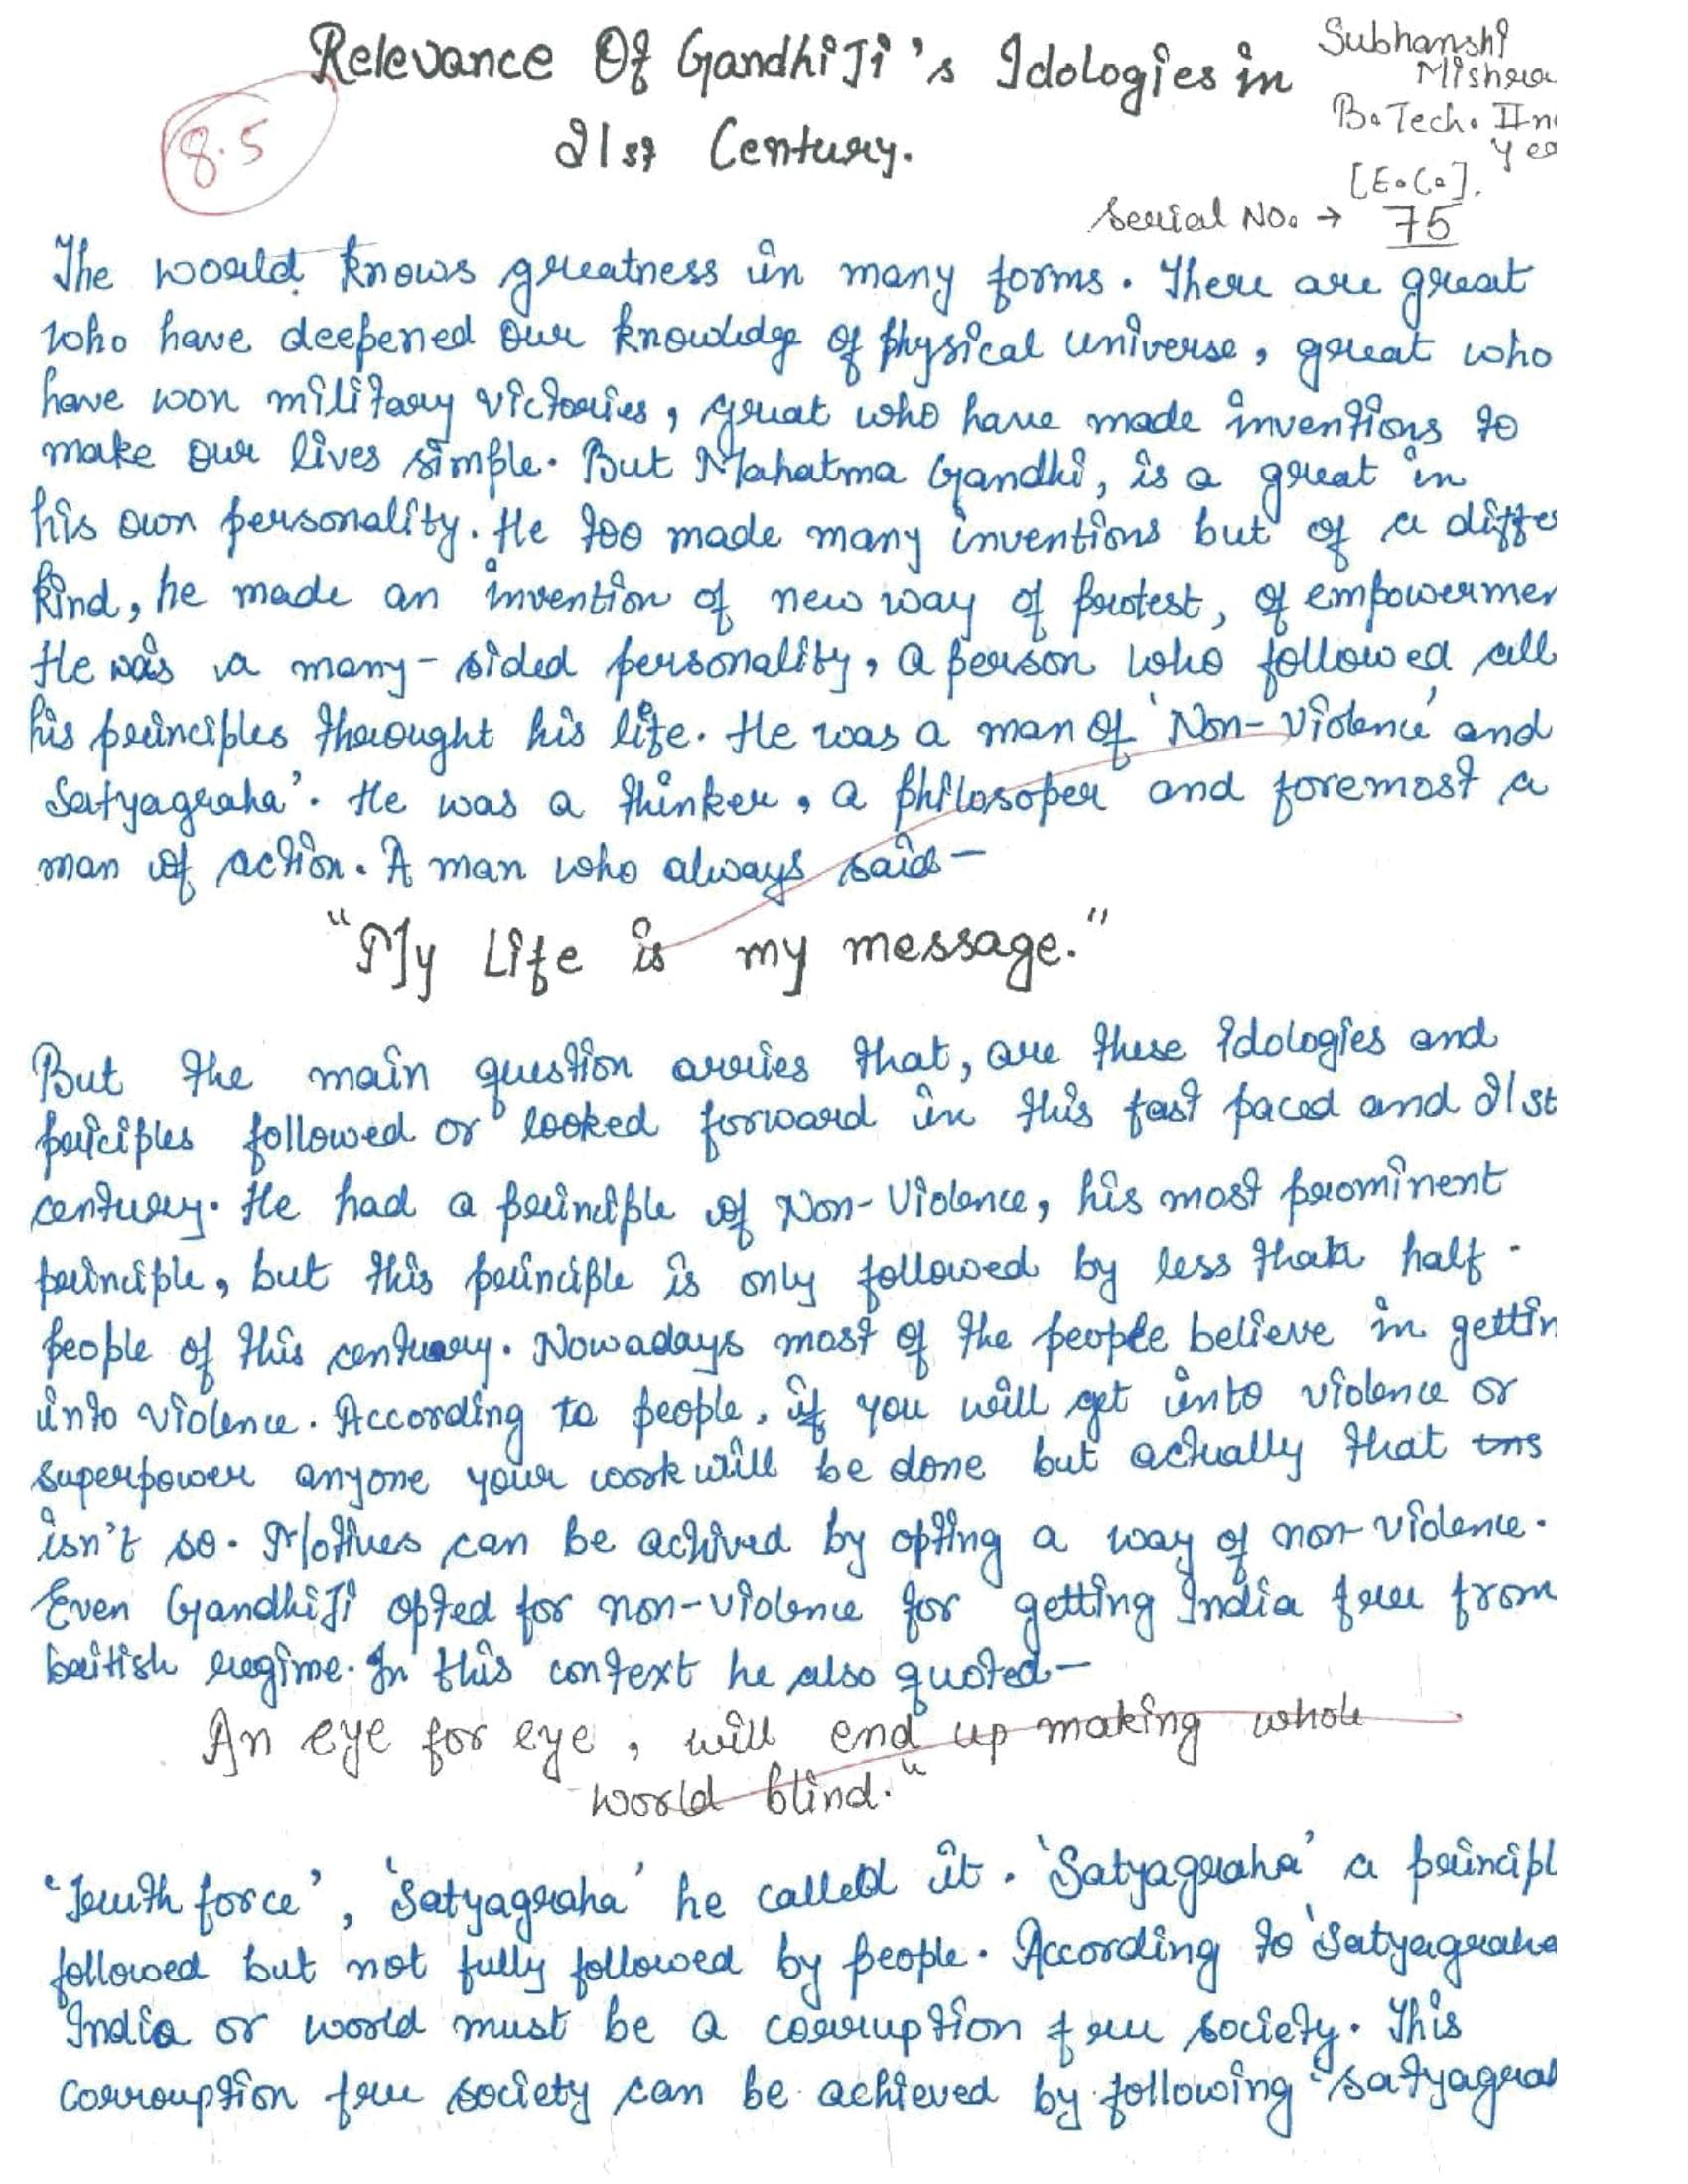 010 Essay2 Gandhiji Essay Sensational Mahatma Gandhi In Gujarati Pdf Free Download Hindi Language Ma Nibandh Full